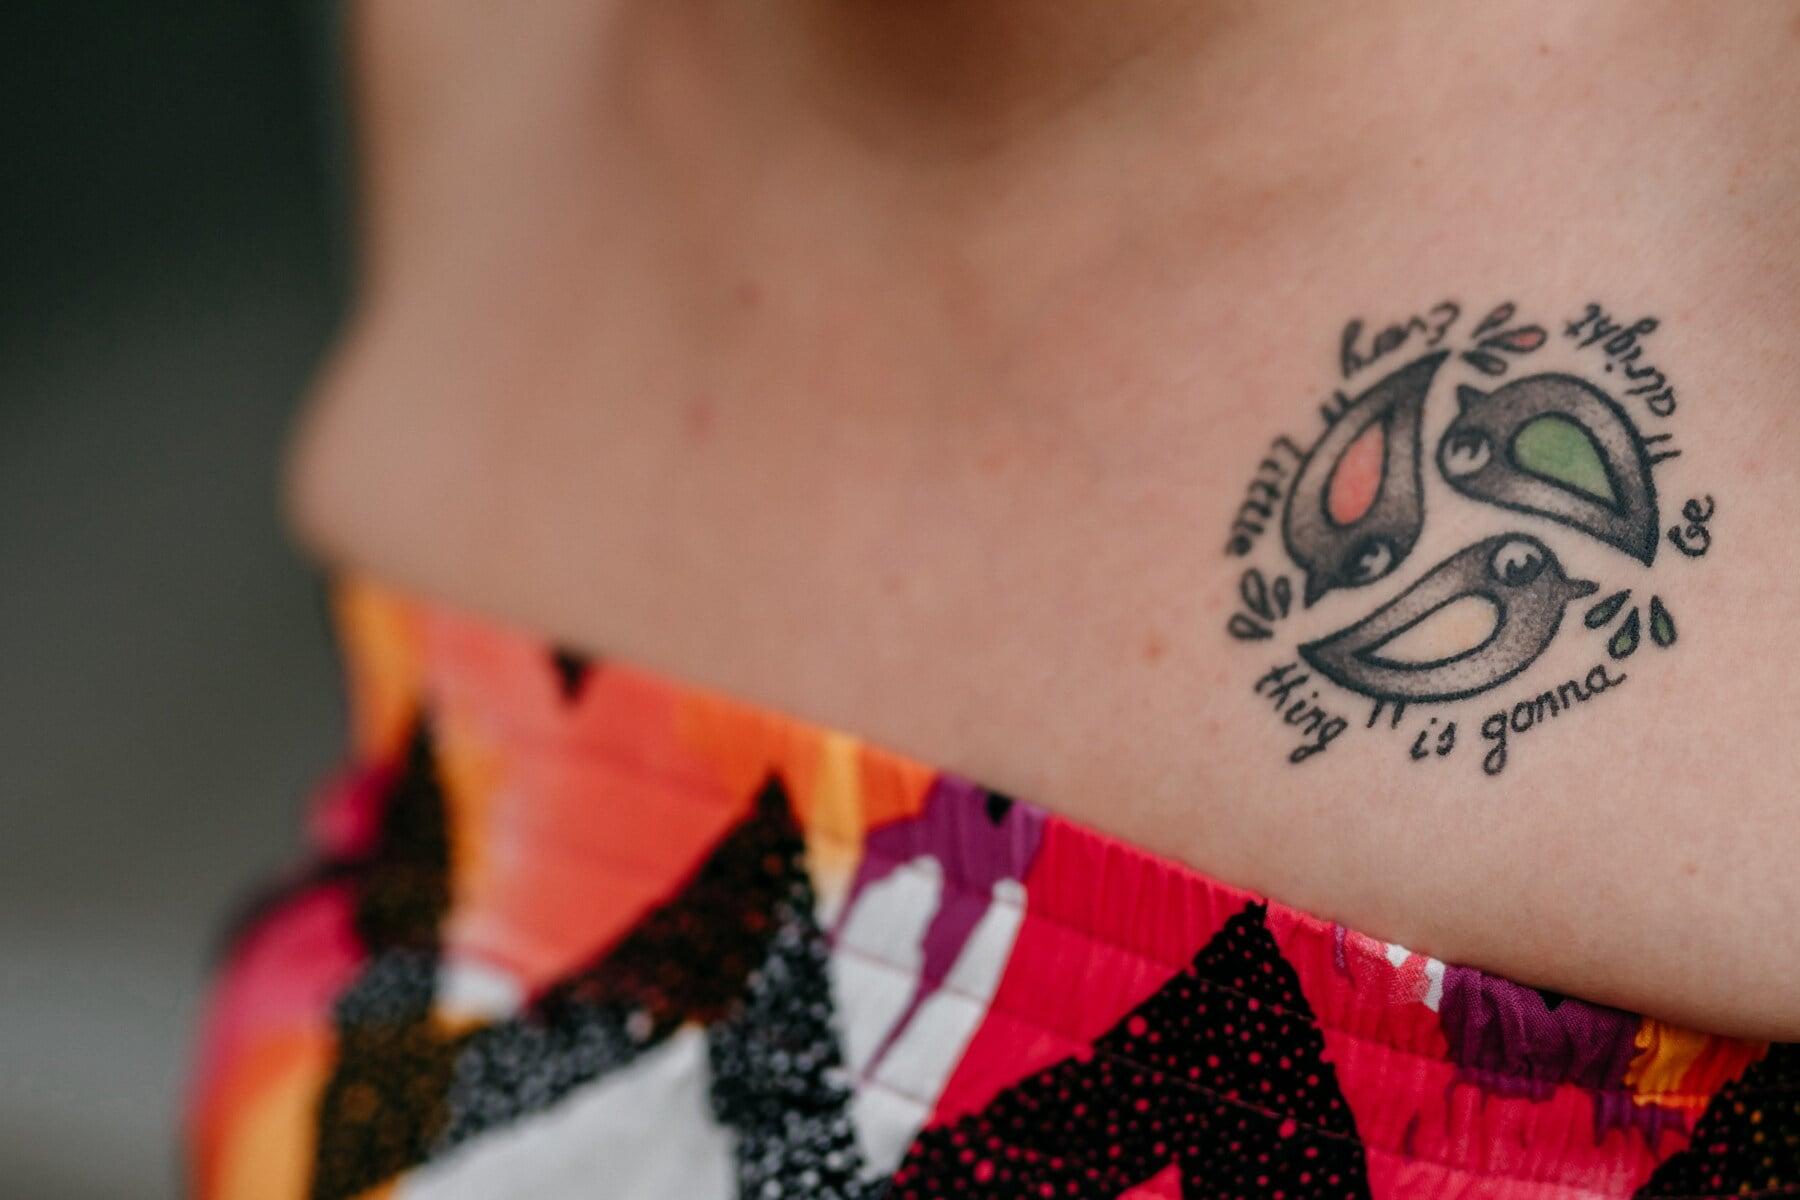 feminine, Tätowierung, Symbol, Design, Haut, Vögel, drei, Miniatur, Frau, Mädchen